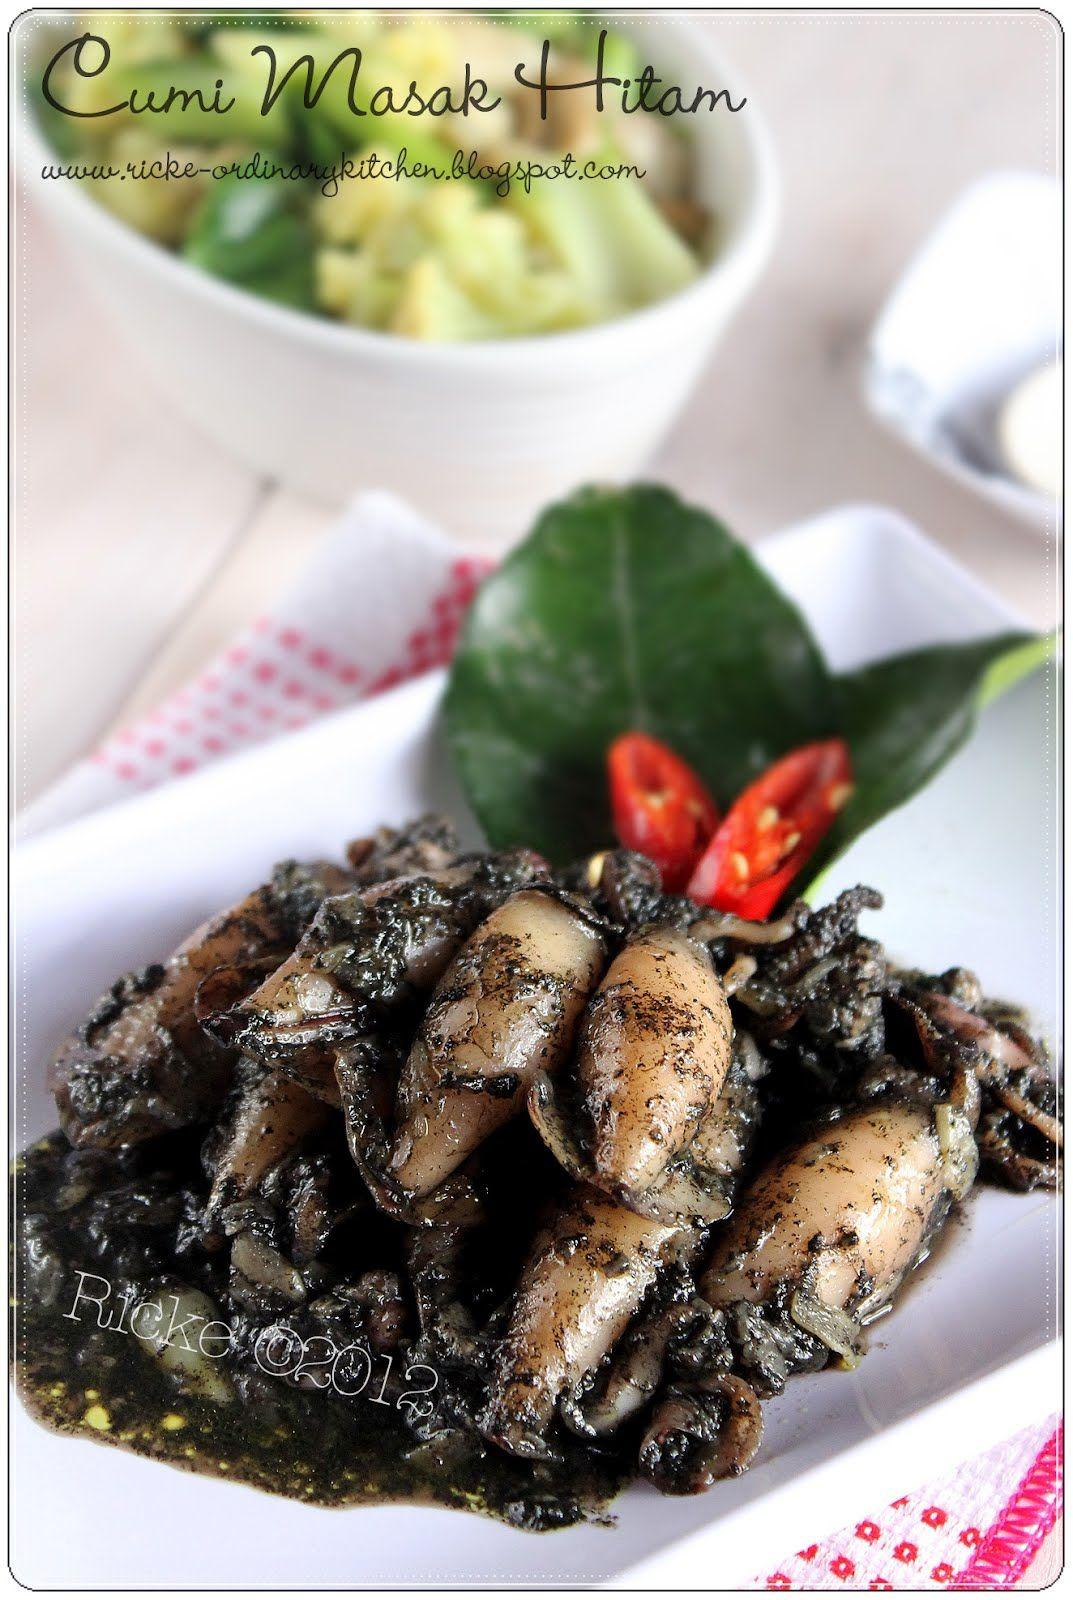 Cumi Masak Hitam Cumi Masak Tinta Makanan Ringan Sehat Resep Masakan Resep Masakan Indonesia